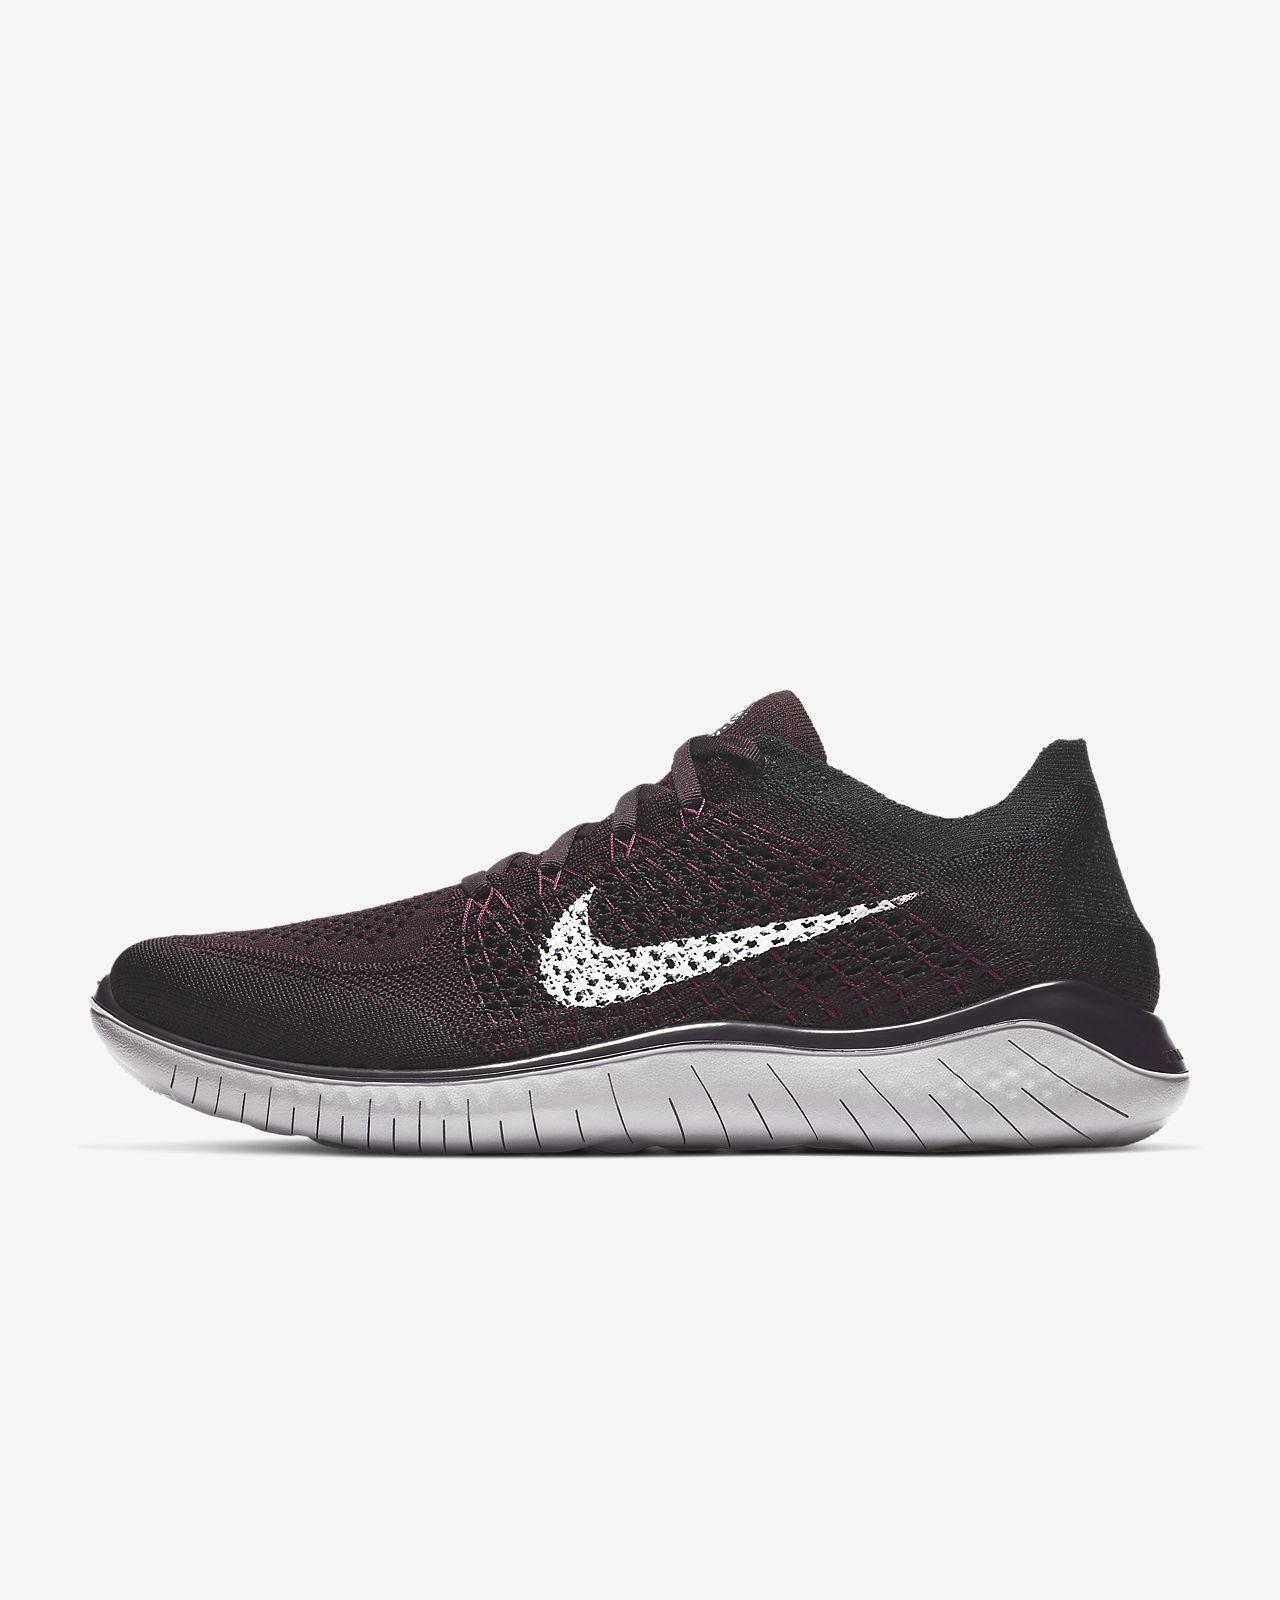 Hombre Flyknit 2018 Rn Nike De Running Mx Calzado Para Free qfZwg6